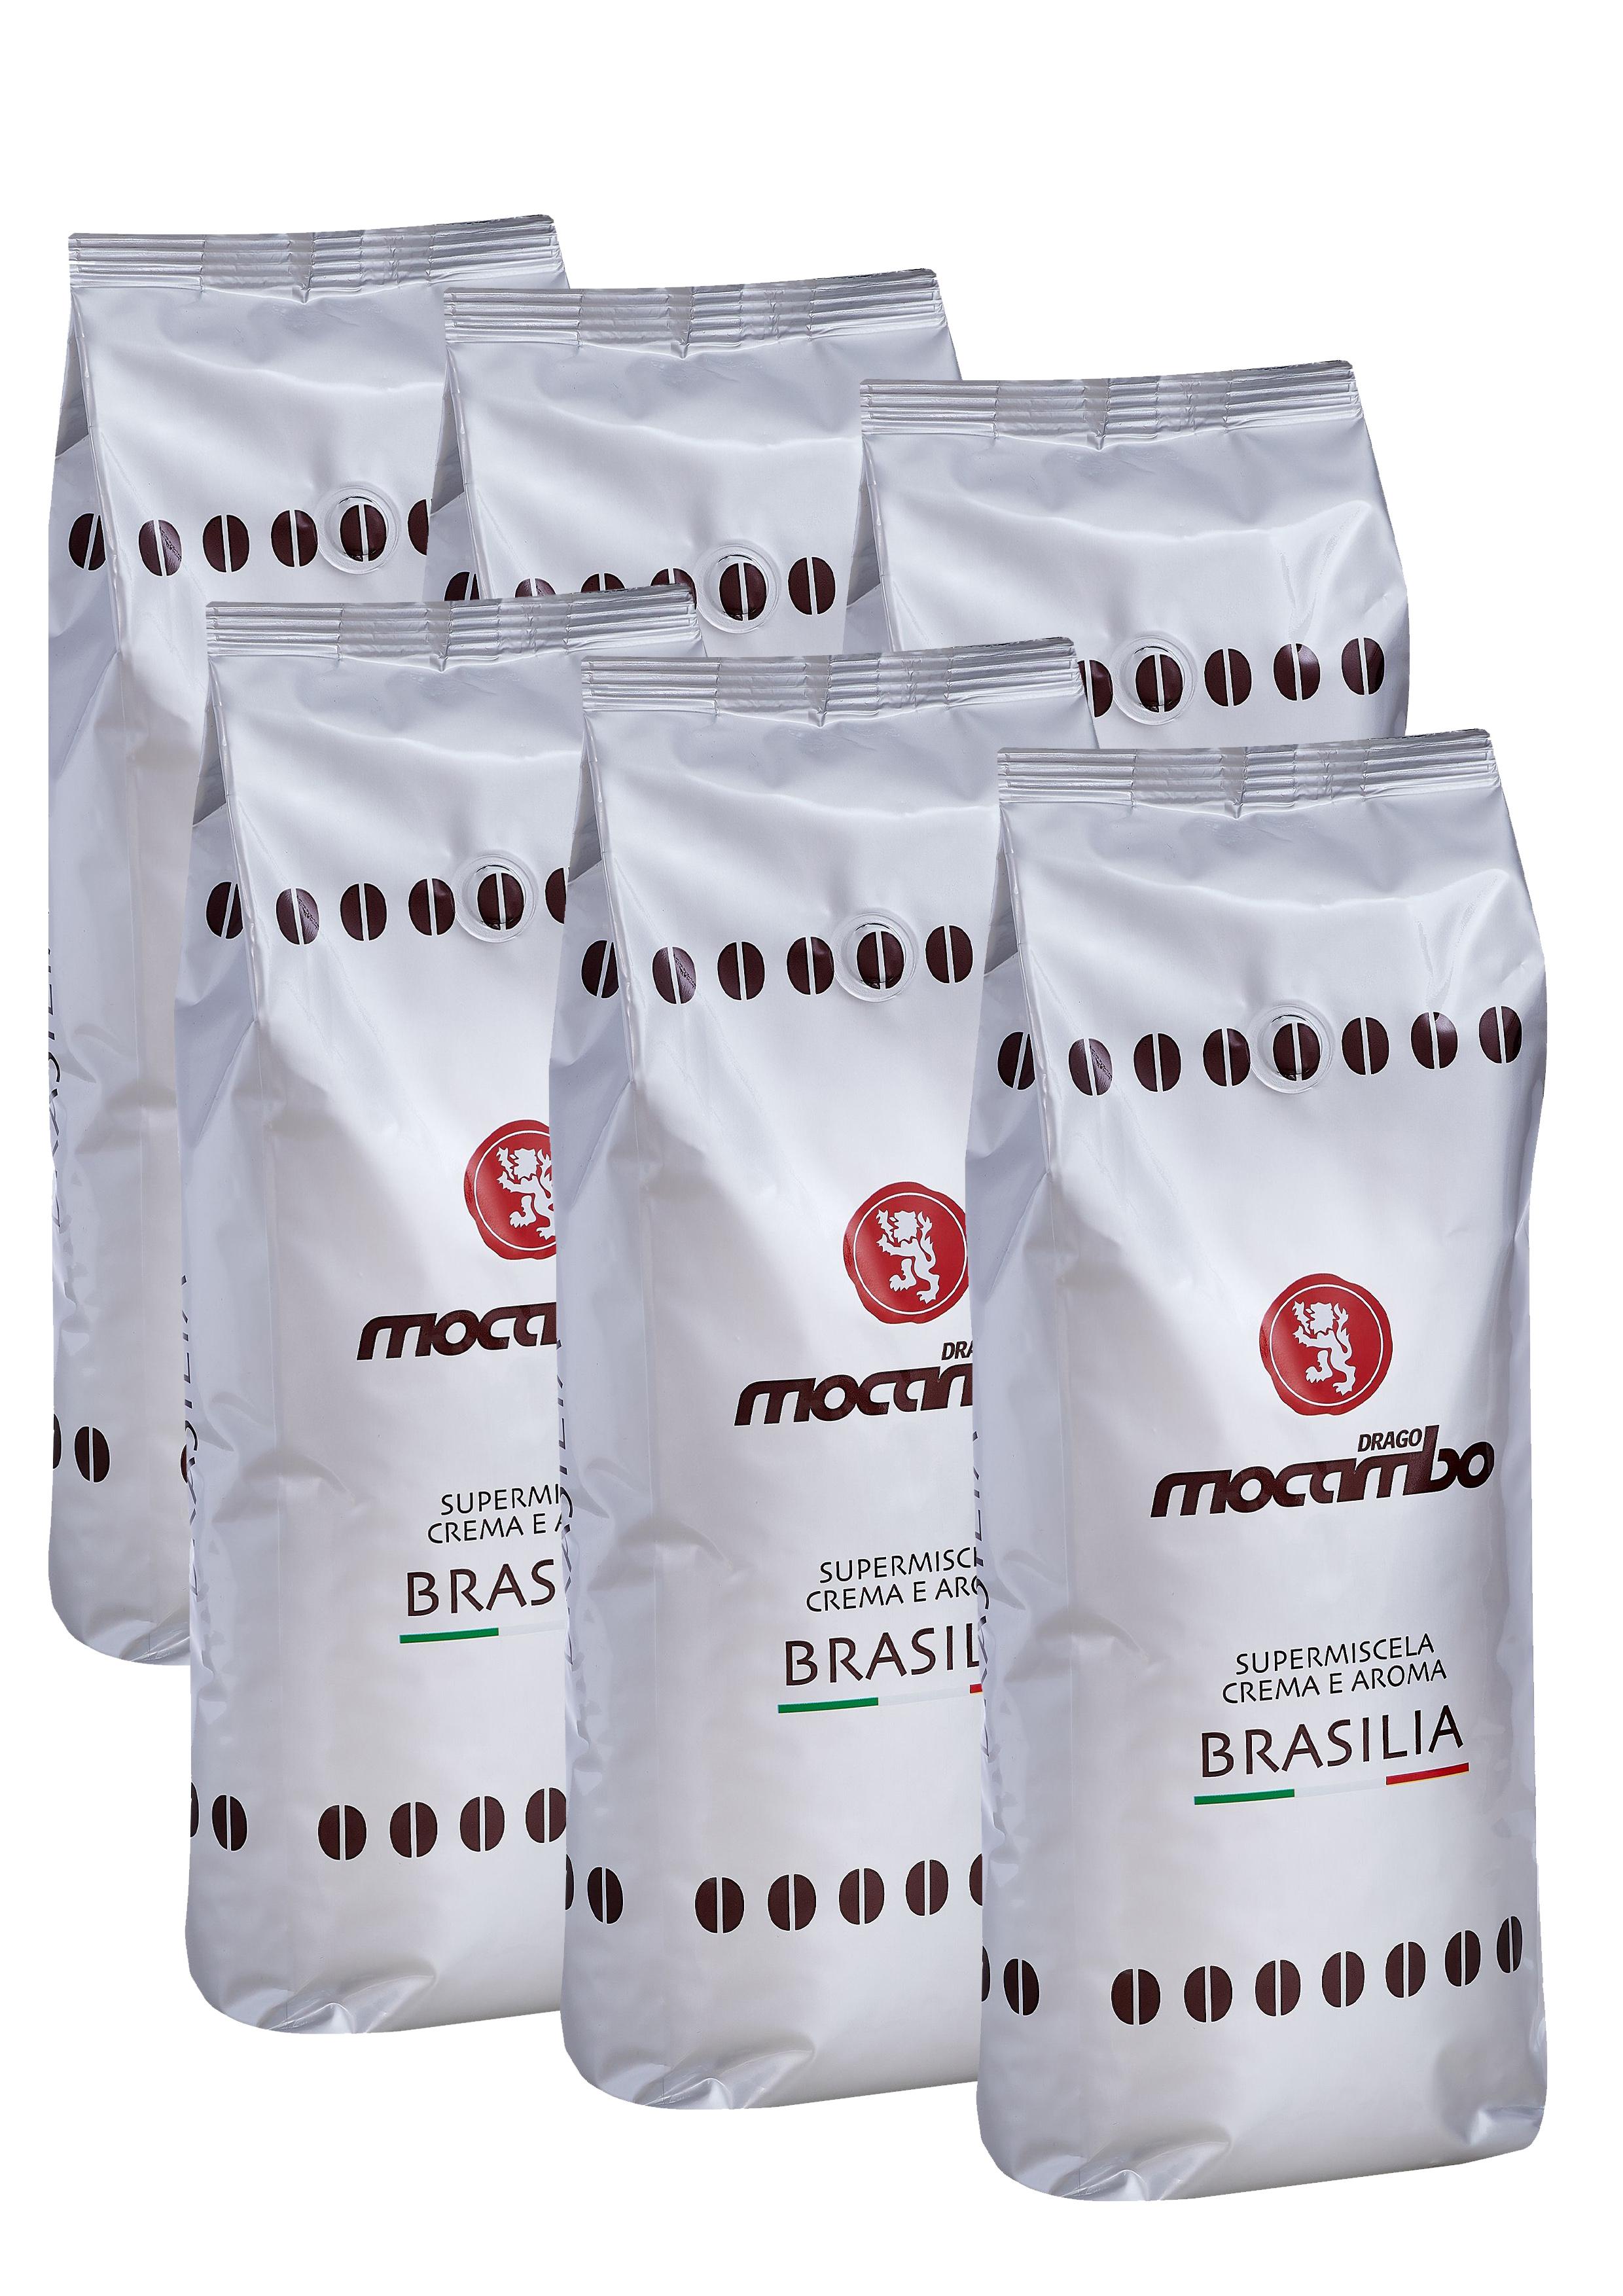 Mocambo Brasilia, Espresso Kaffee Bohnen 6x 1 kg